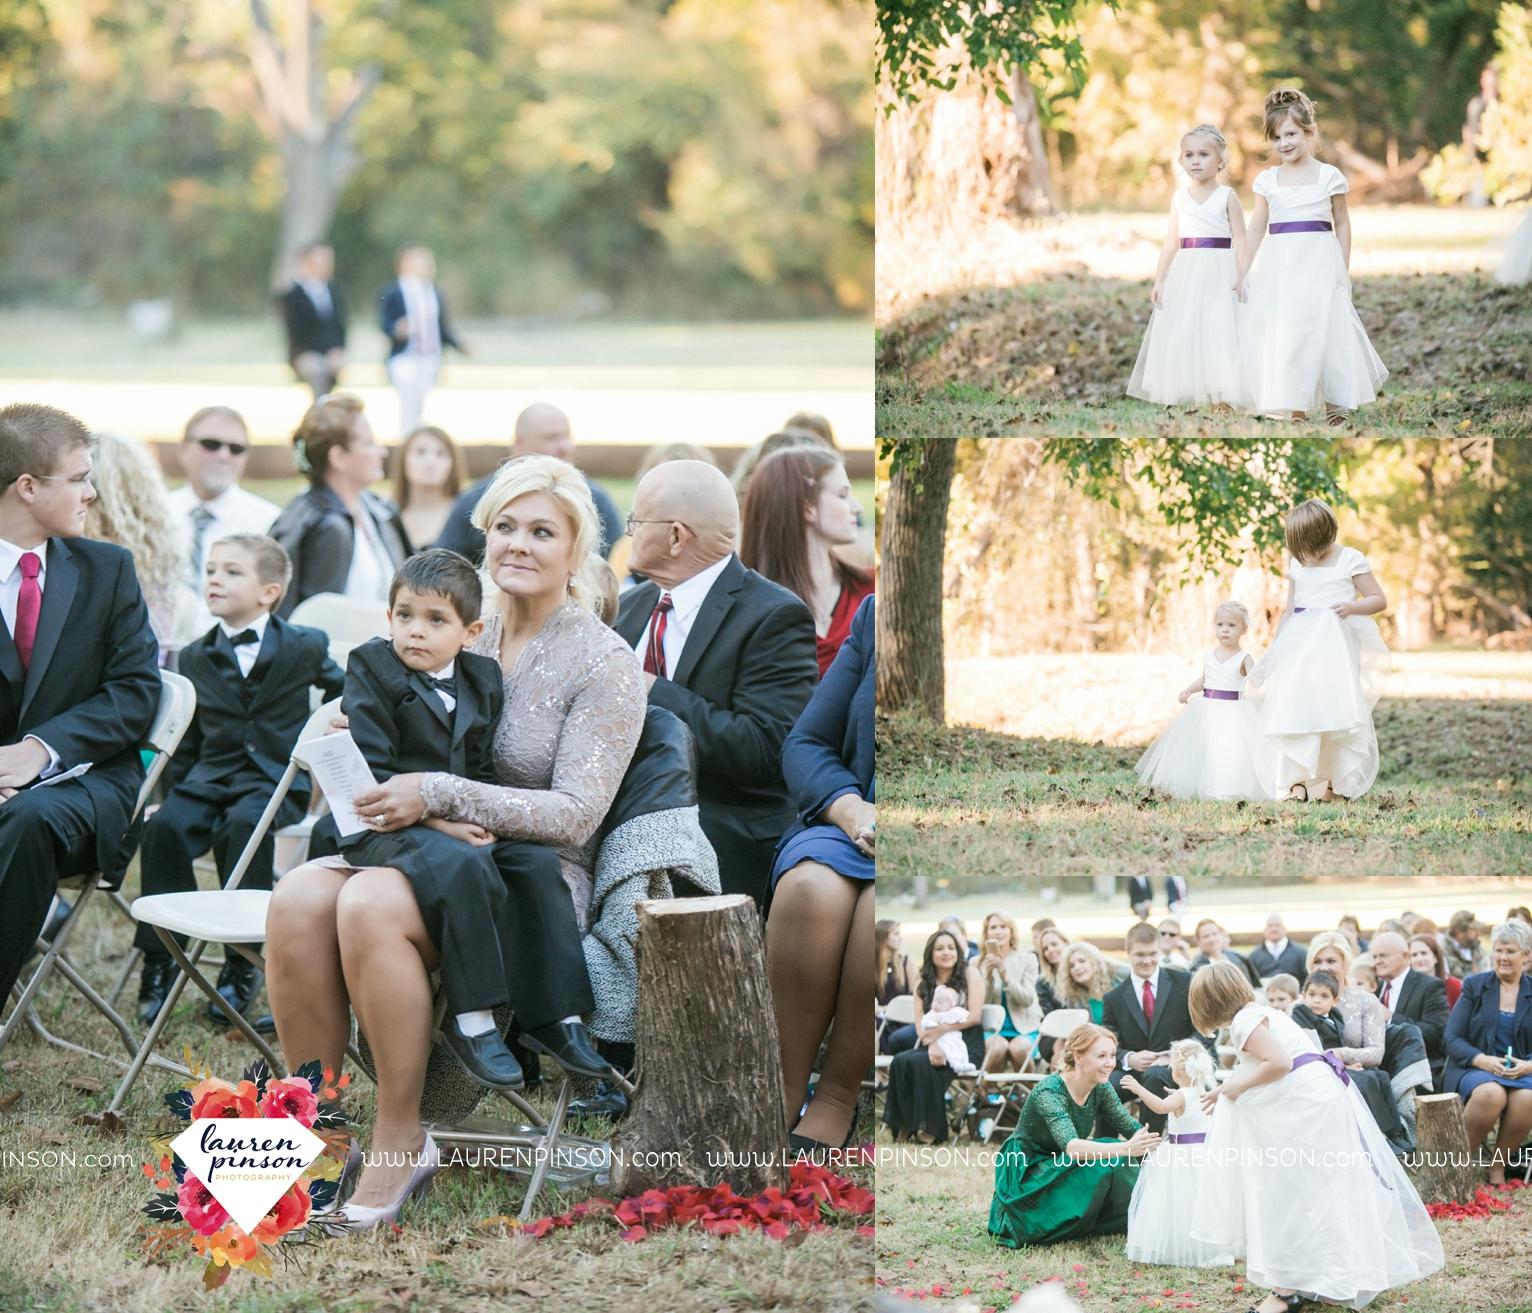 rustic-wichita-falls-texas-wedding-photographer-gold-glam-mayfield-events-market-street-united-allue-bridals-fall_1675.jpg